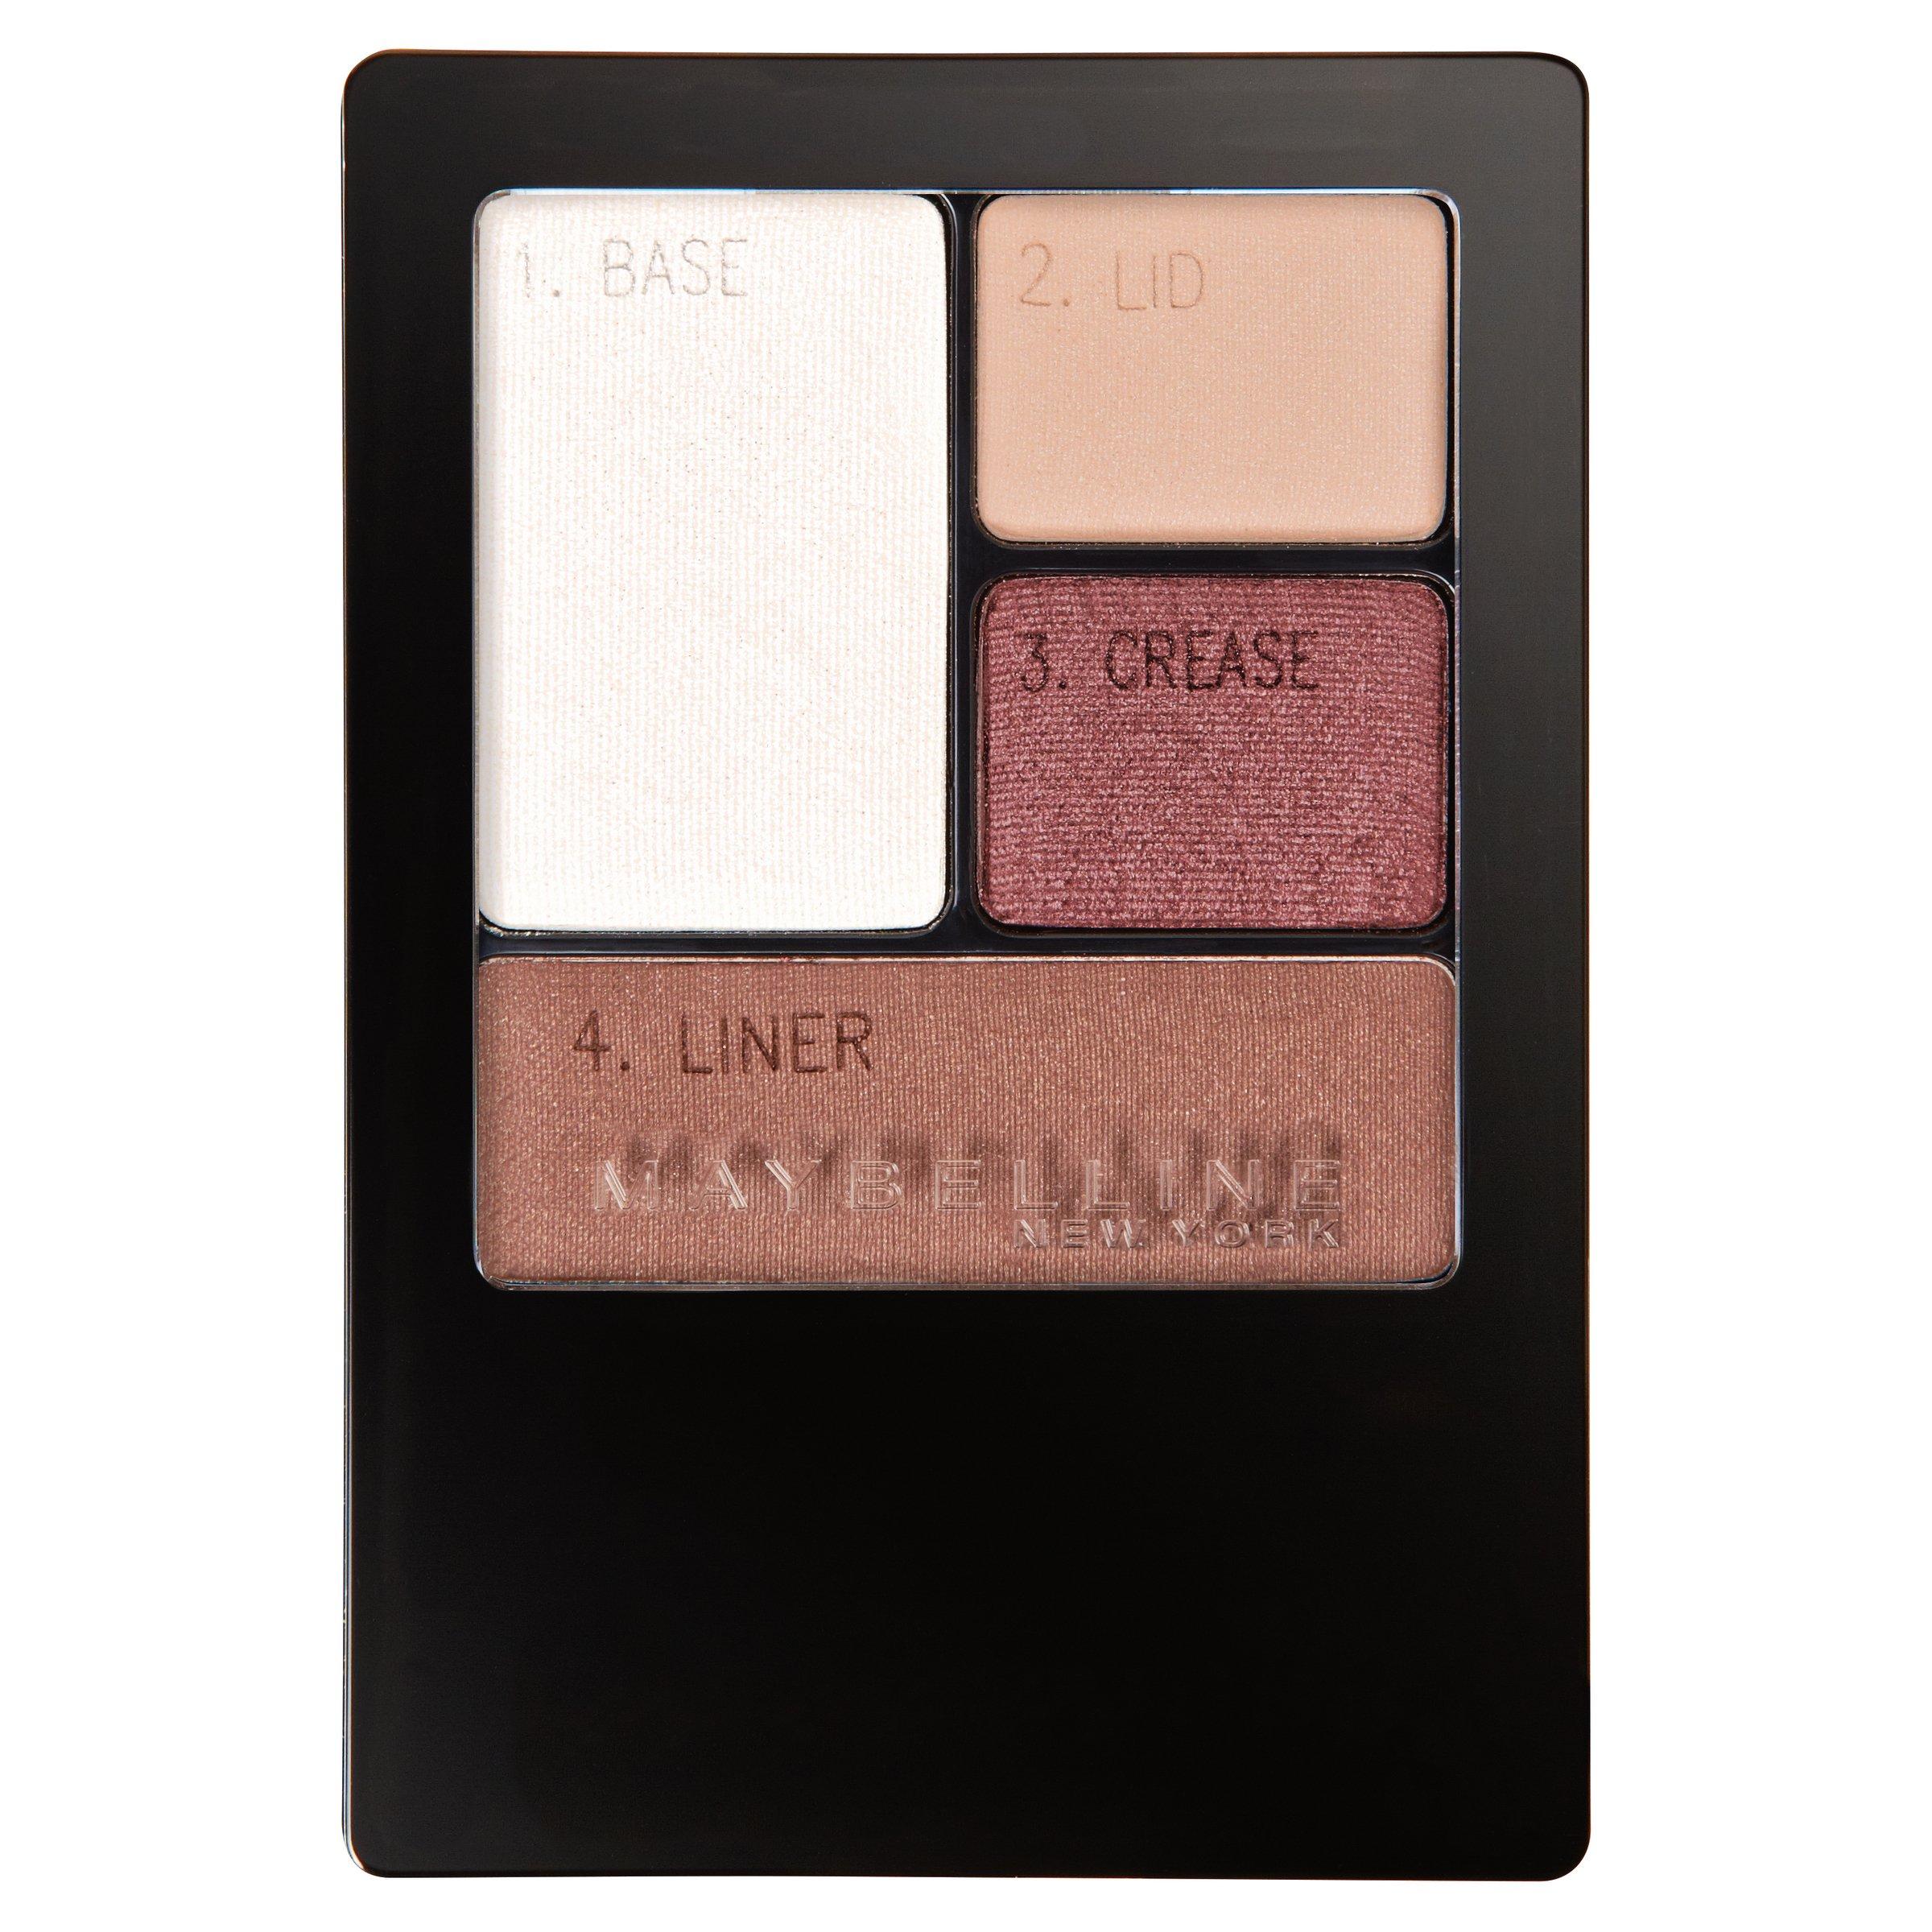 Maybelline Expert Wear Eyeshadow Quads, Designer Chocolates, 0.17 oz.